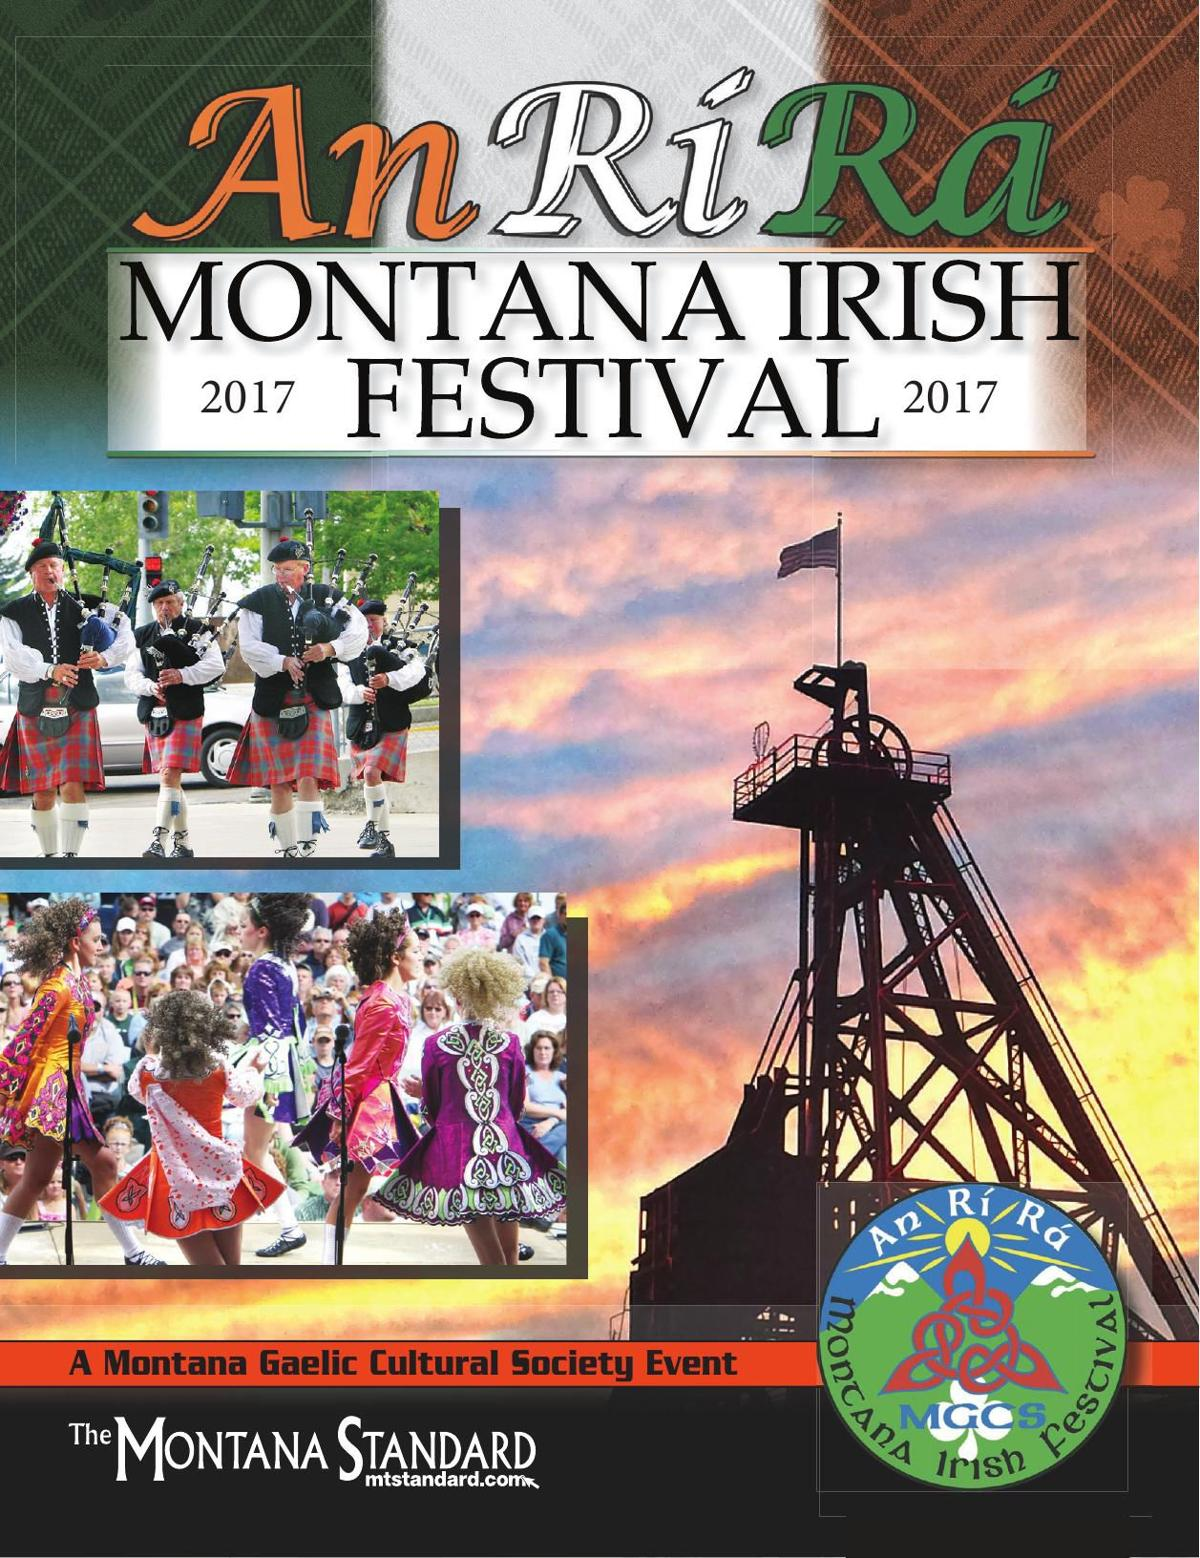 An Ri Ra - Montana Irish Festival - 2017